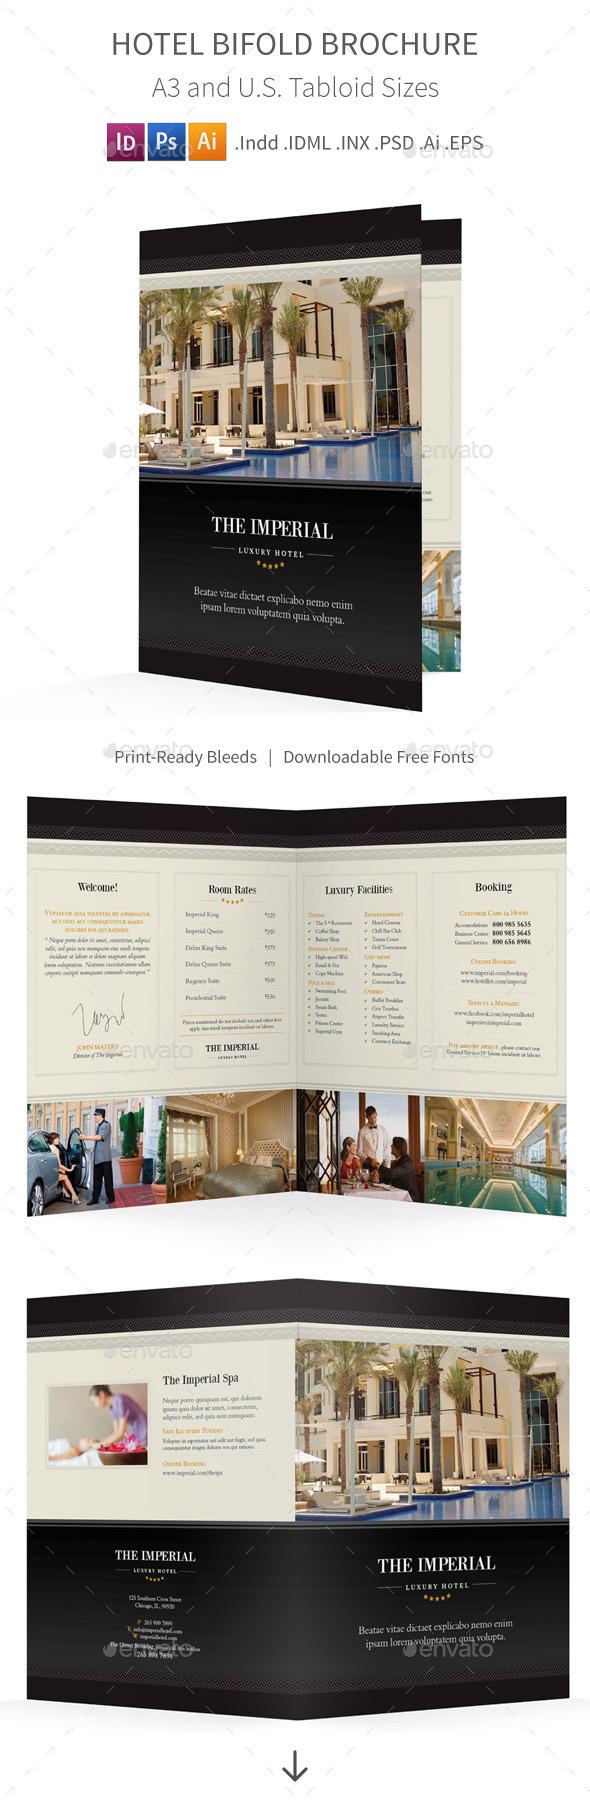 GraphicRiver Hotel Bifold Halffold Brochure 10767016